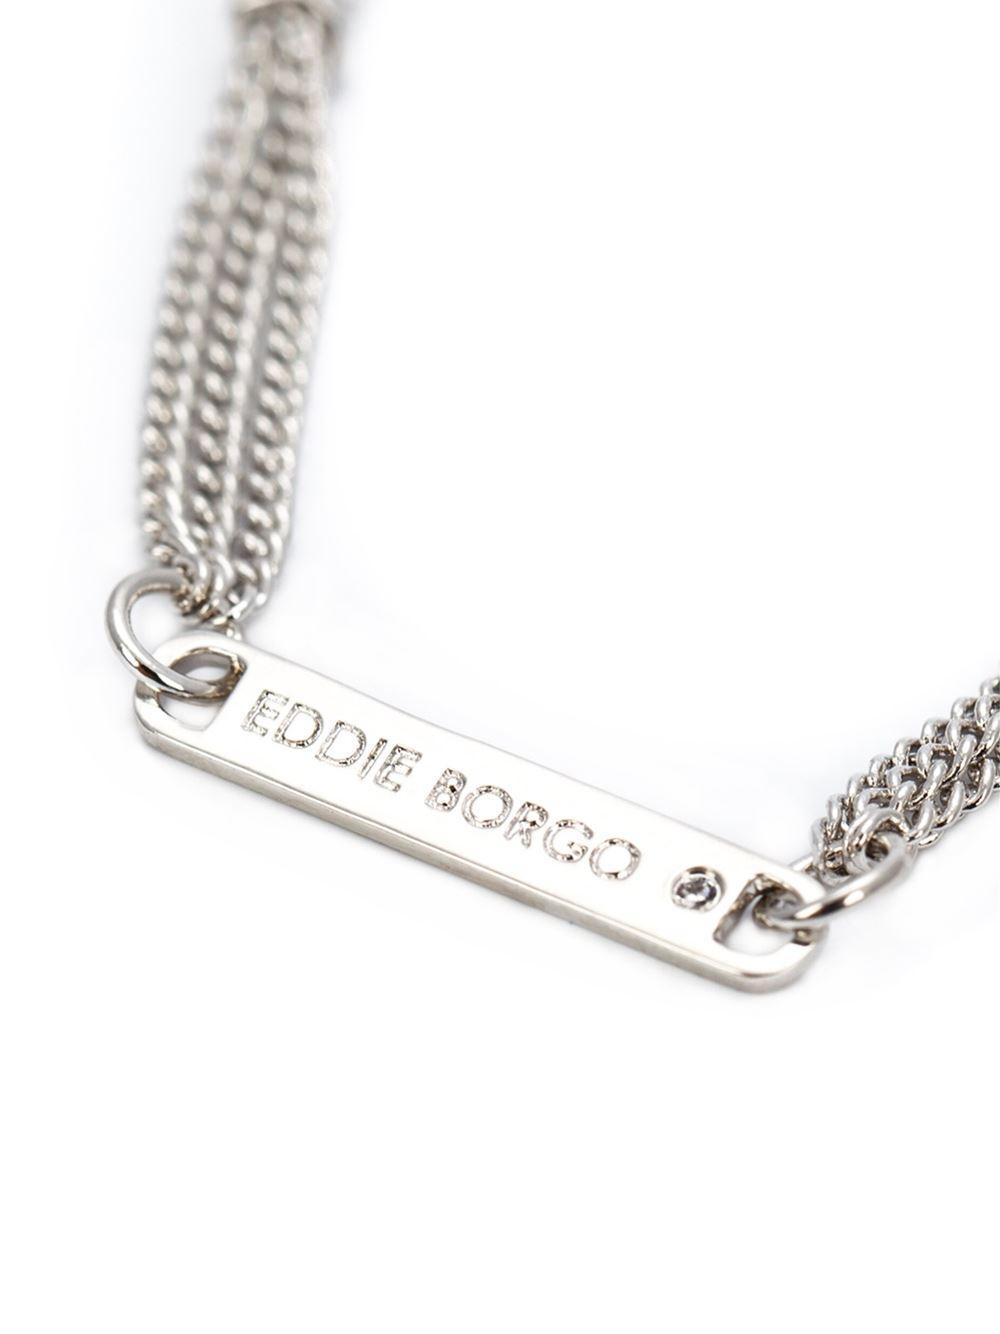 eddie borgo tassel pendant necklace in silver metallic